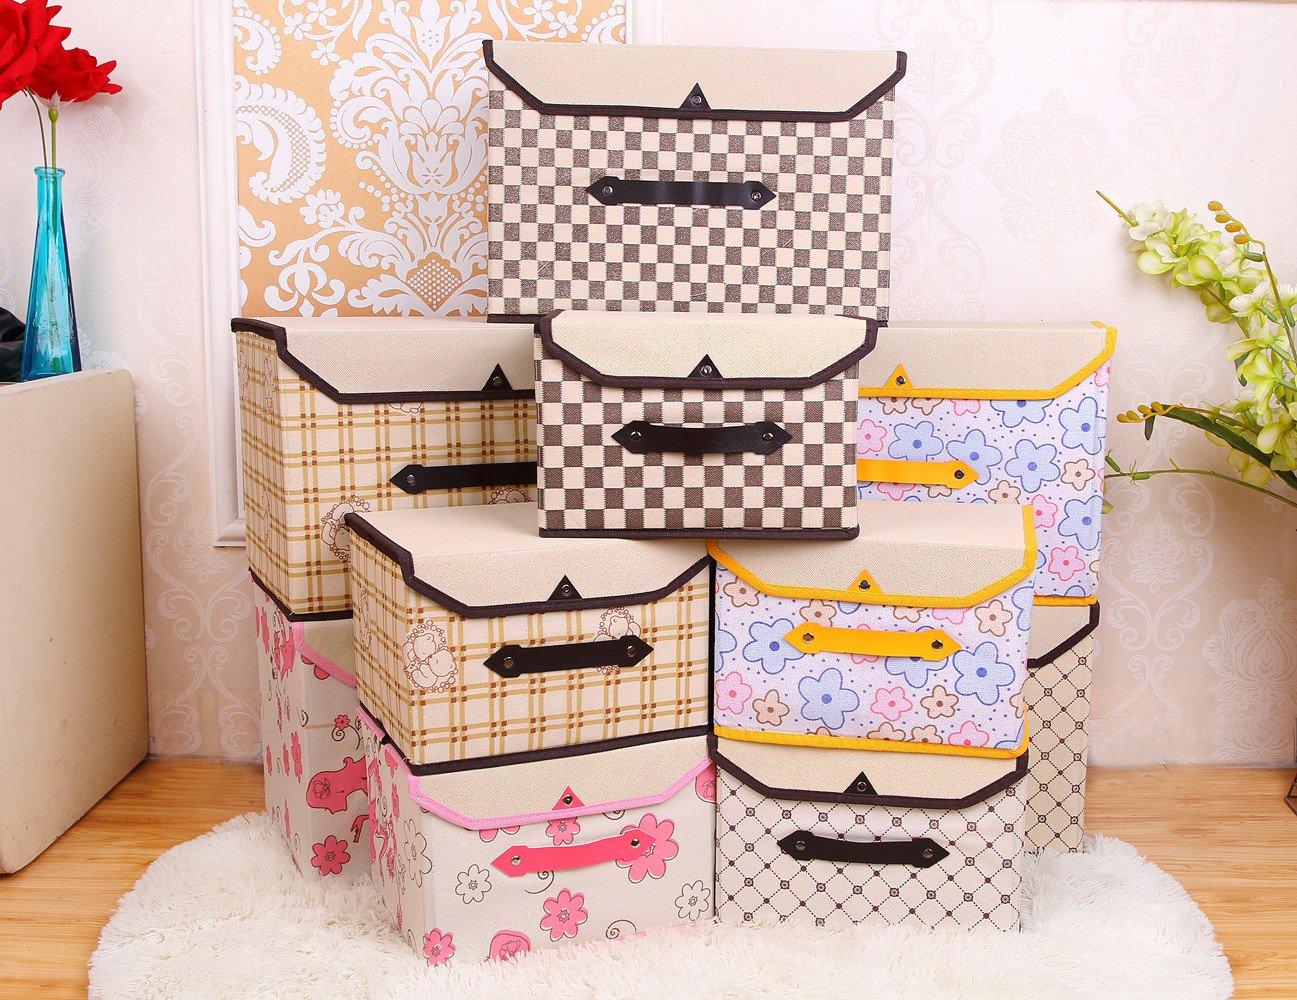 HAKACC Fabric Storage Bin,Simple and Stylish,Grid Design,Beige(Set of 2)